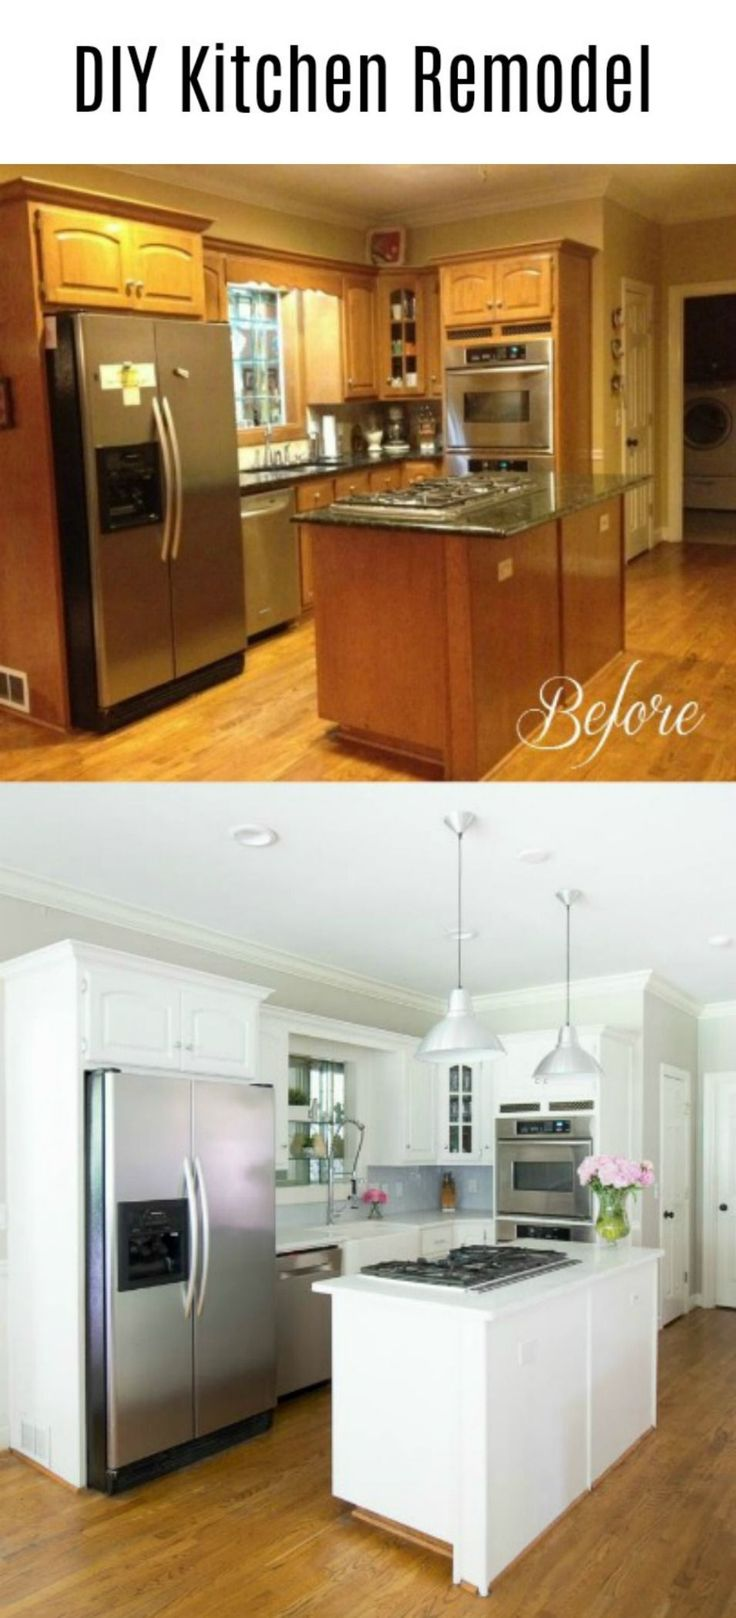 best kitchen remodel on a budget images on pinterest backyard